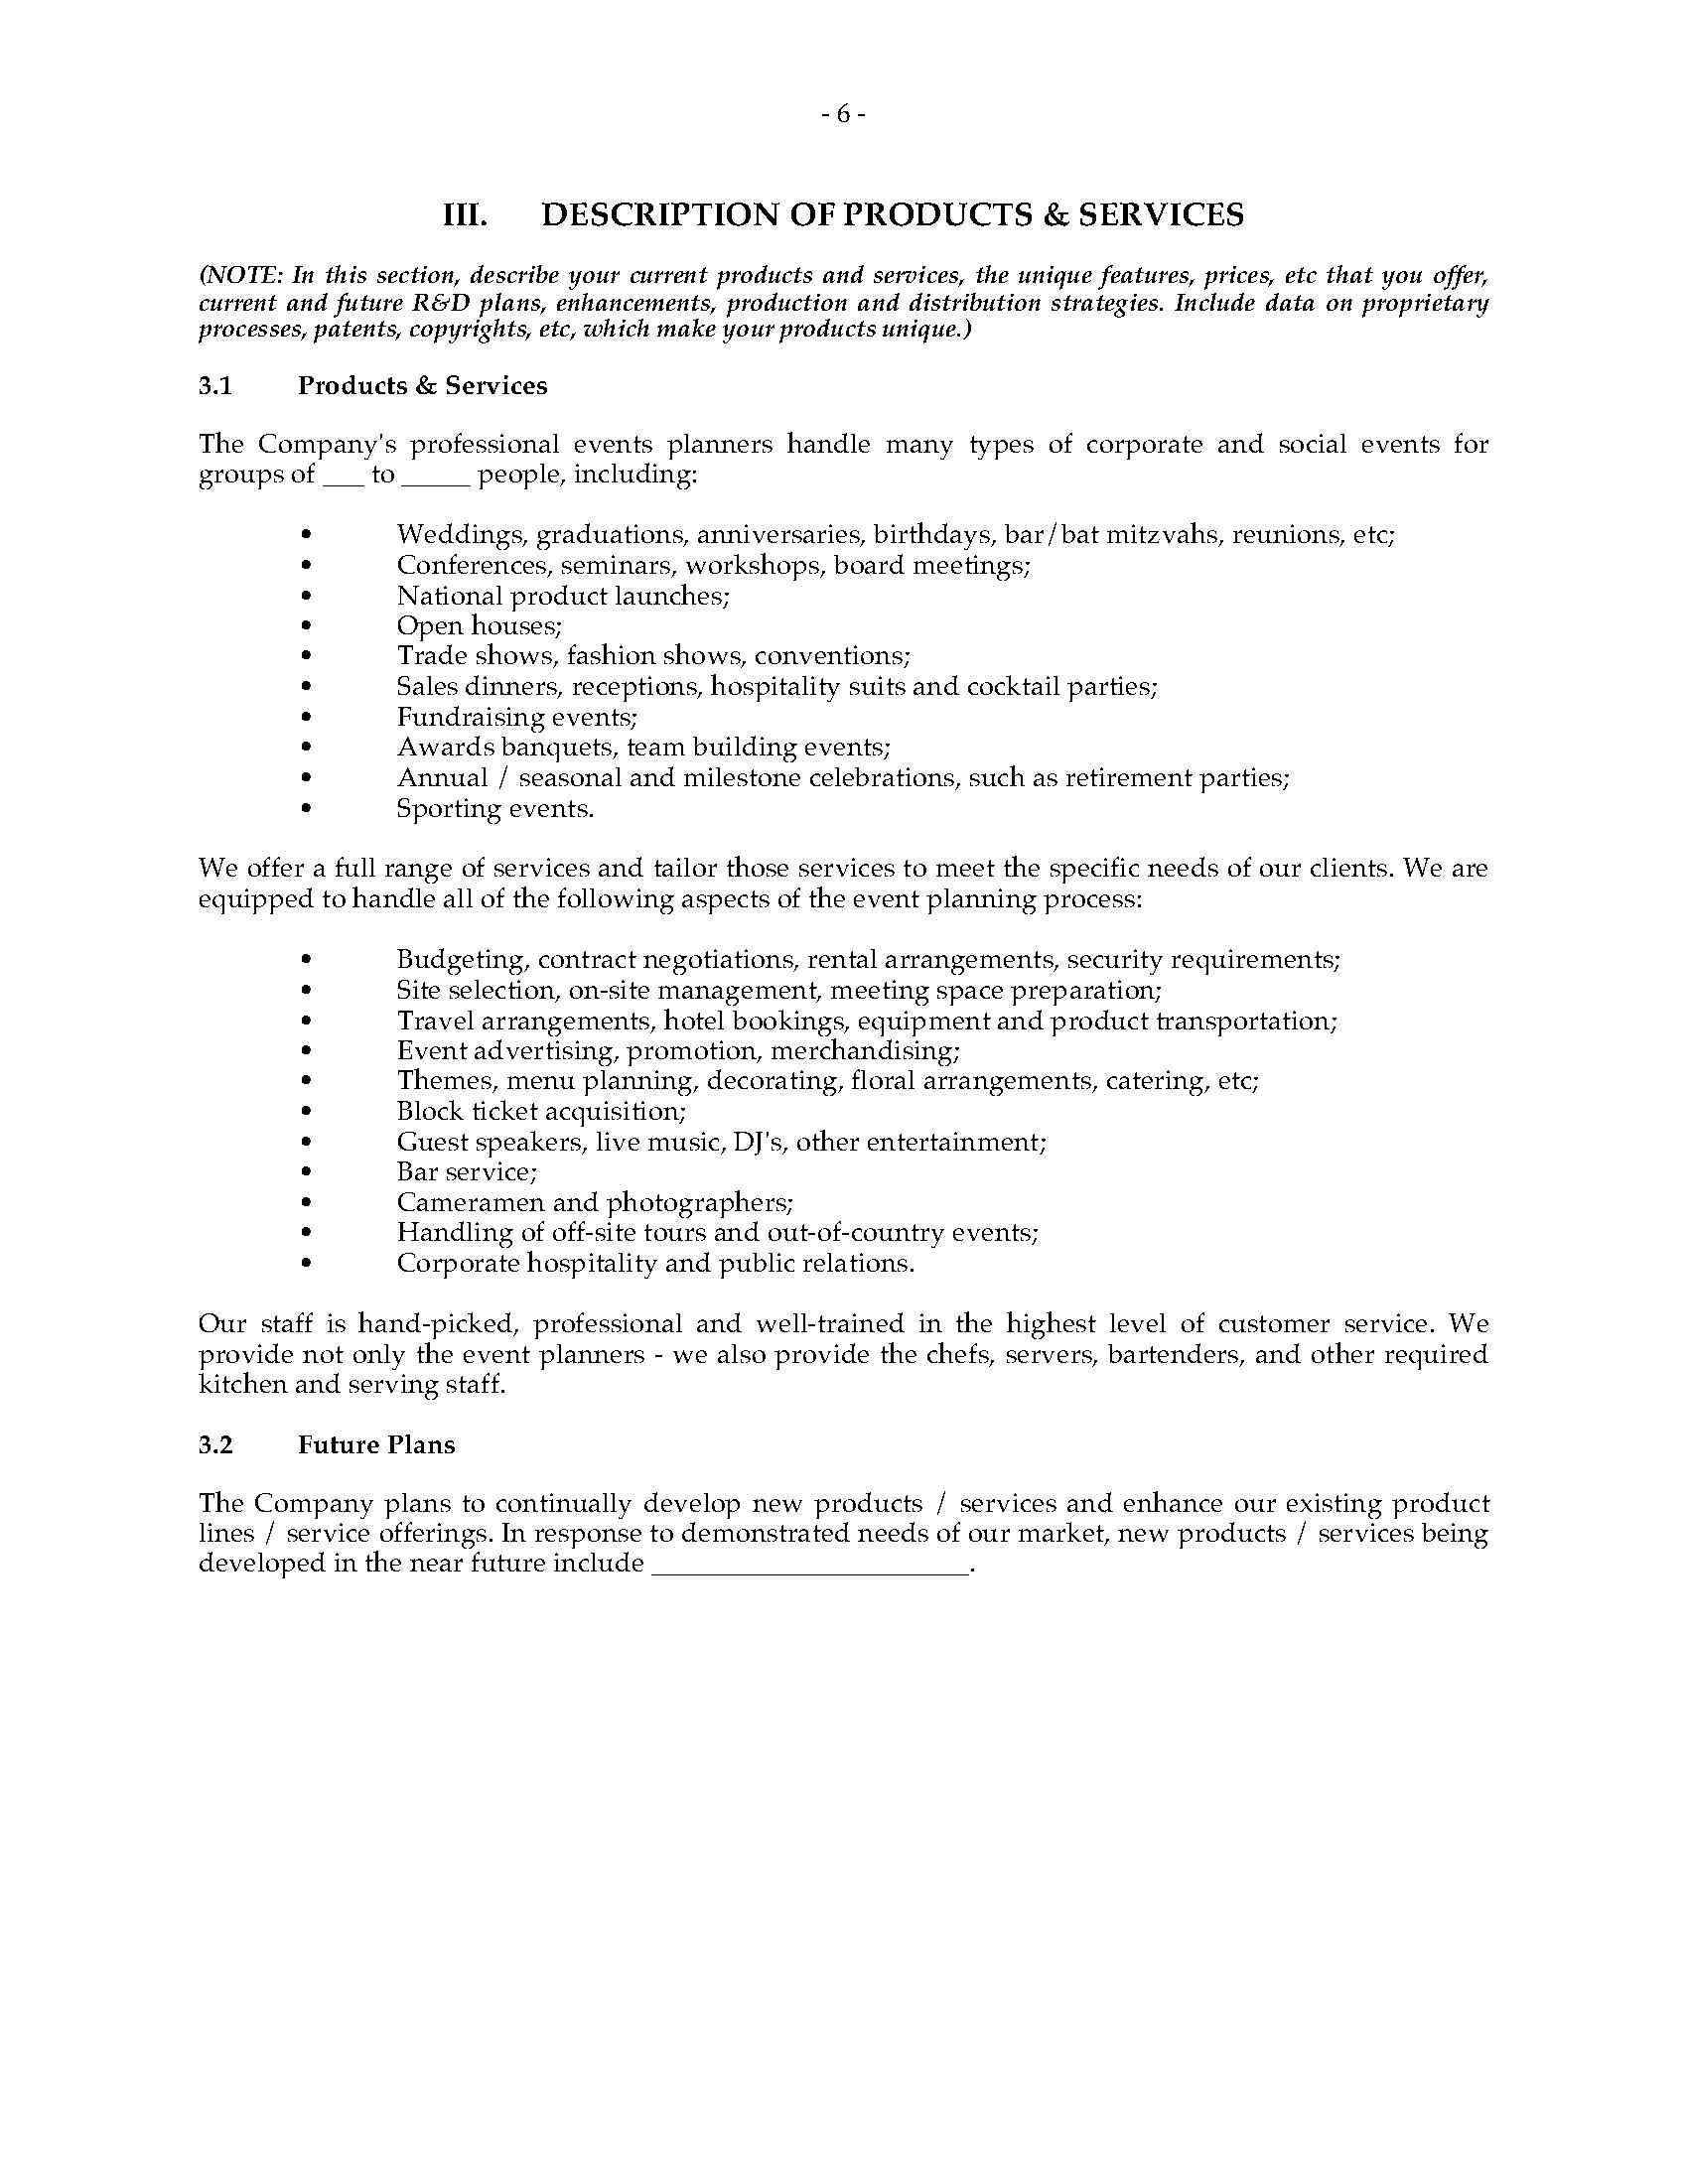 event production contract - Ideal.vistalist.co